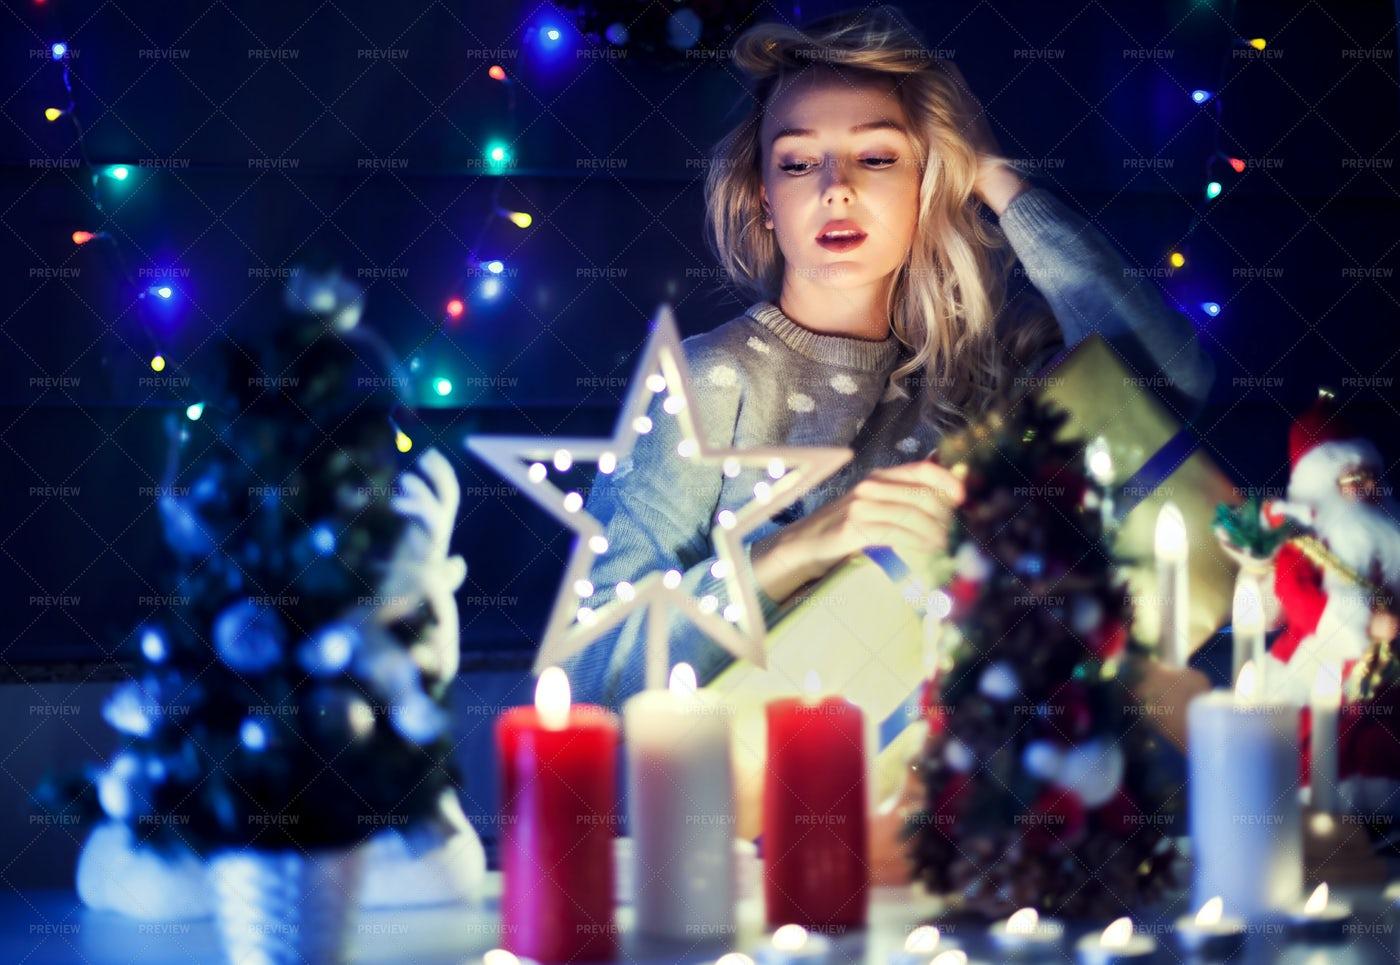 Beautiful Blonde On Christmas: Stock Photos